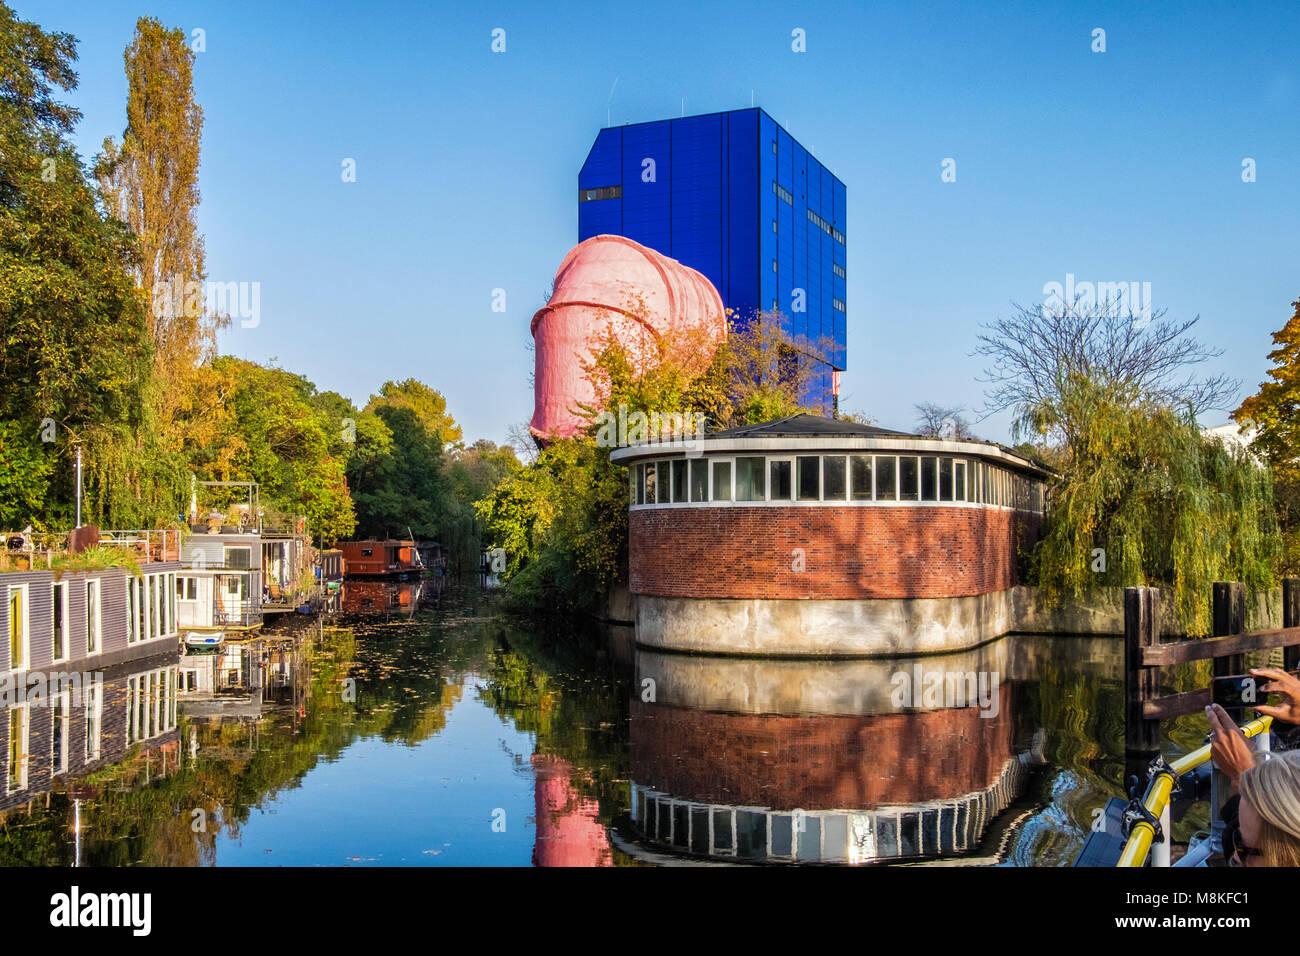 berlin landwehr canal stockfotos berlin landwehr canal. Black Bedroom Furniture Sets. Home Design Ideas